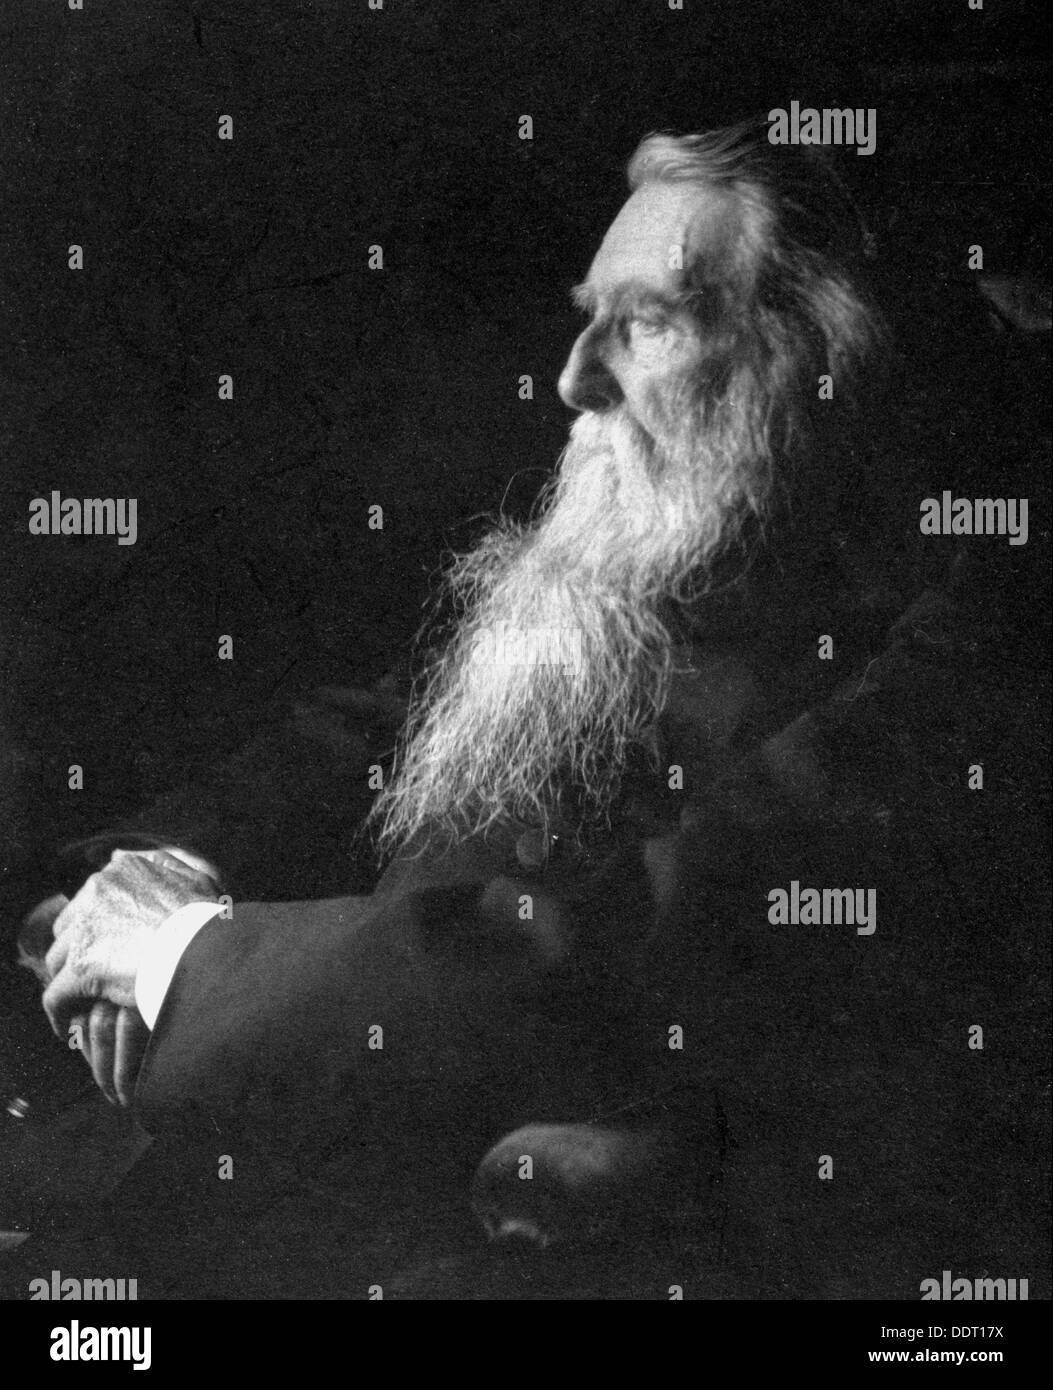 John Ruskin, l'artiste anglais, poète et critique, c1897. Artiste: Otto Emil Hoppe Photo Stock